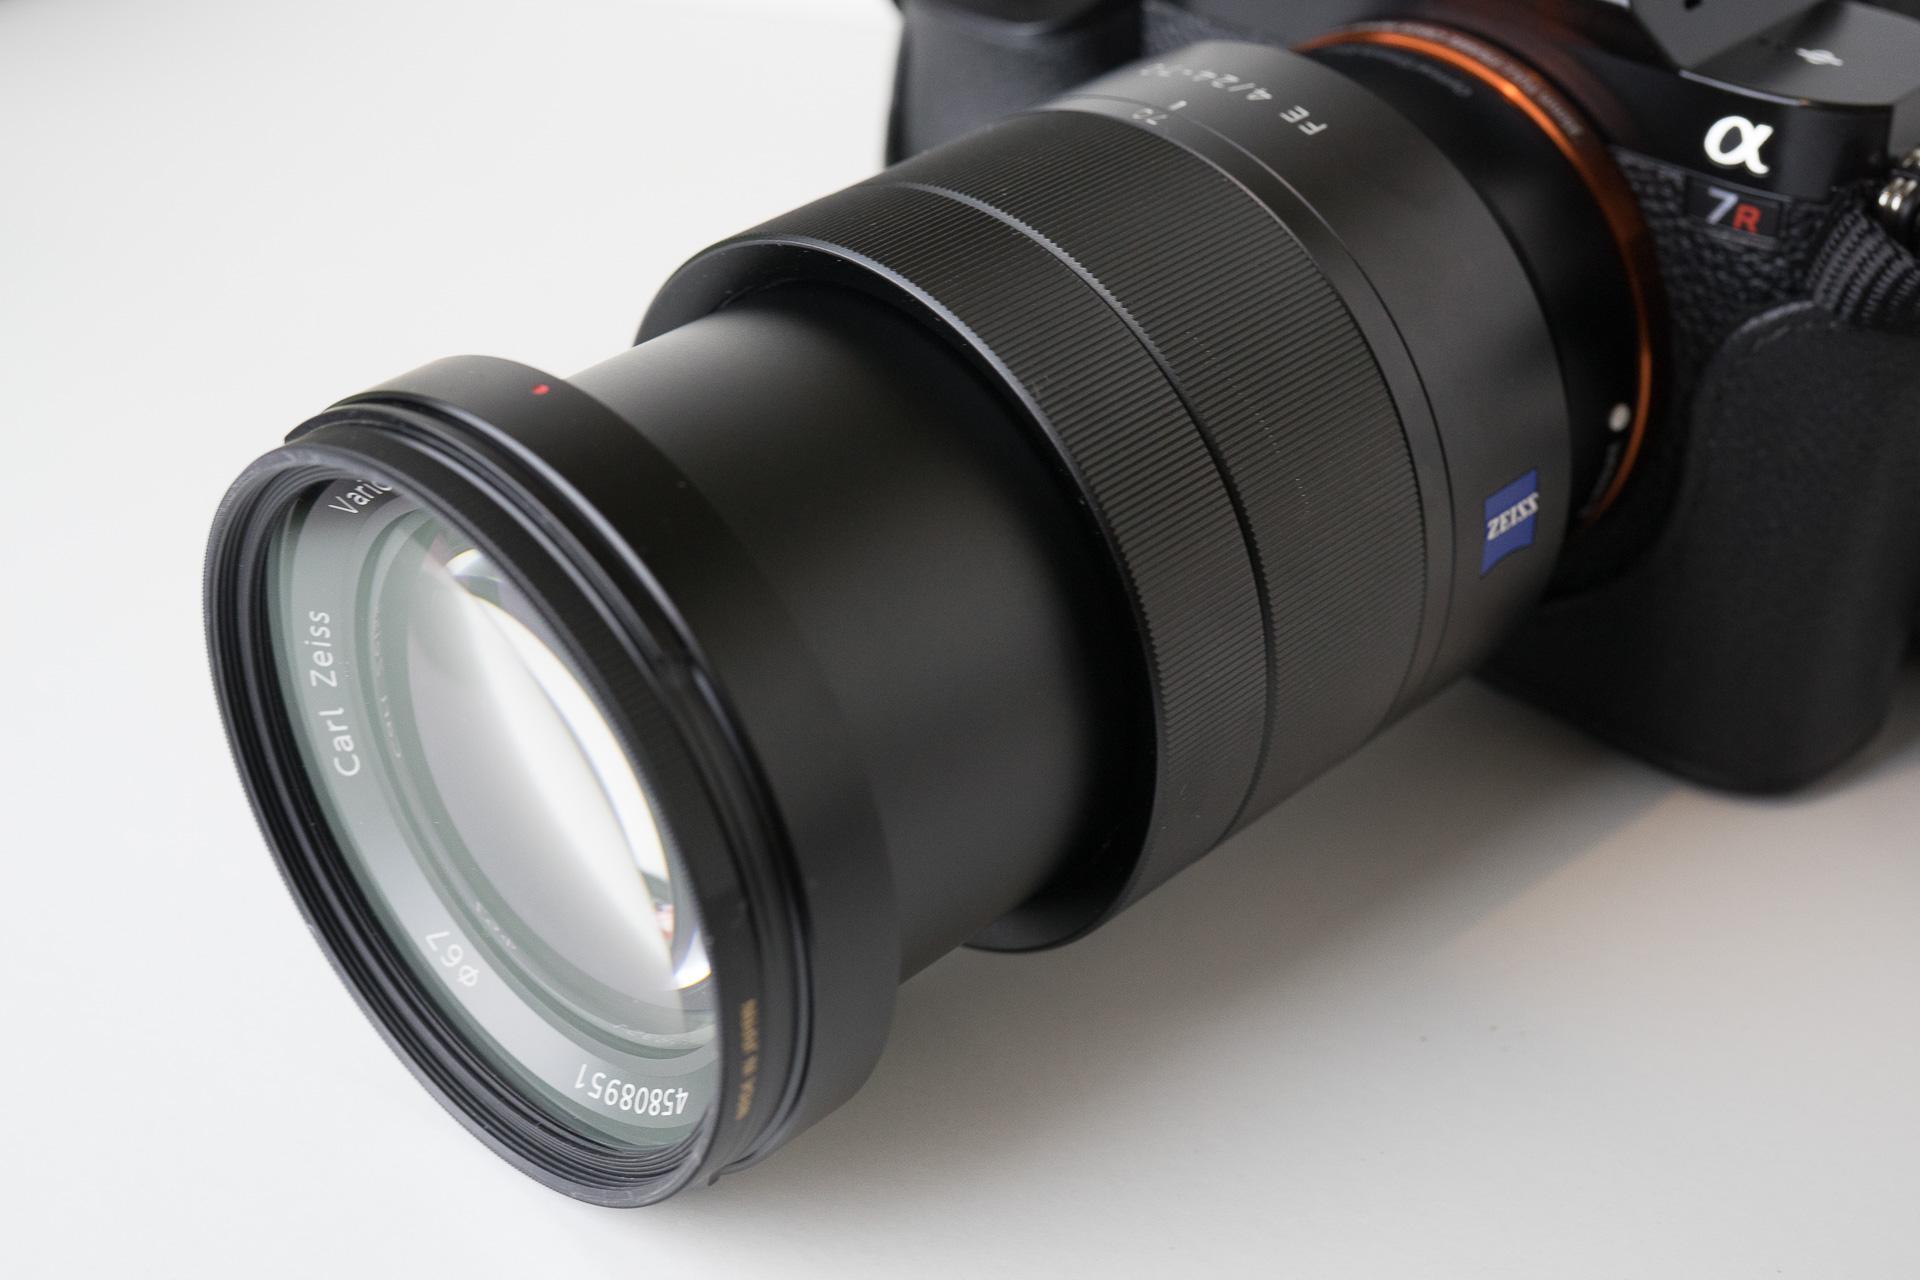 Vario‑Tessar T* FE 24-70mm F4 ZA OSS